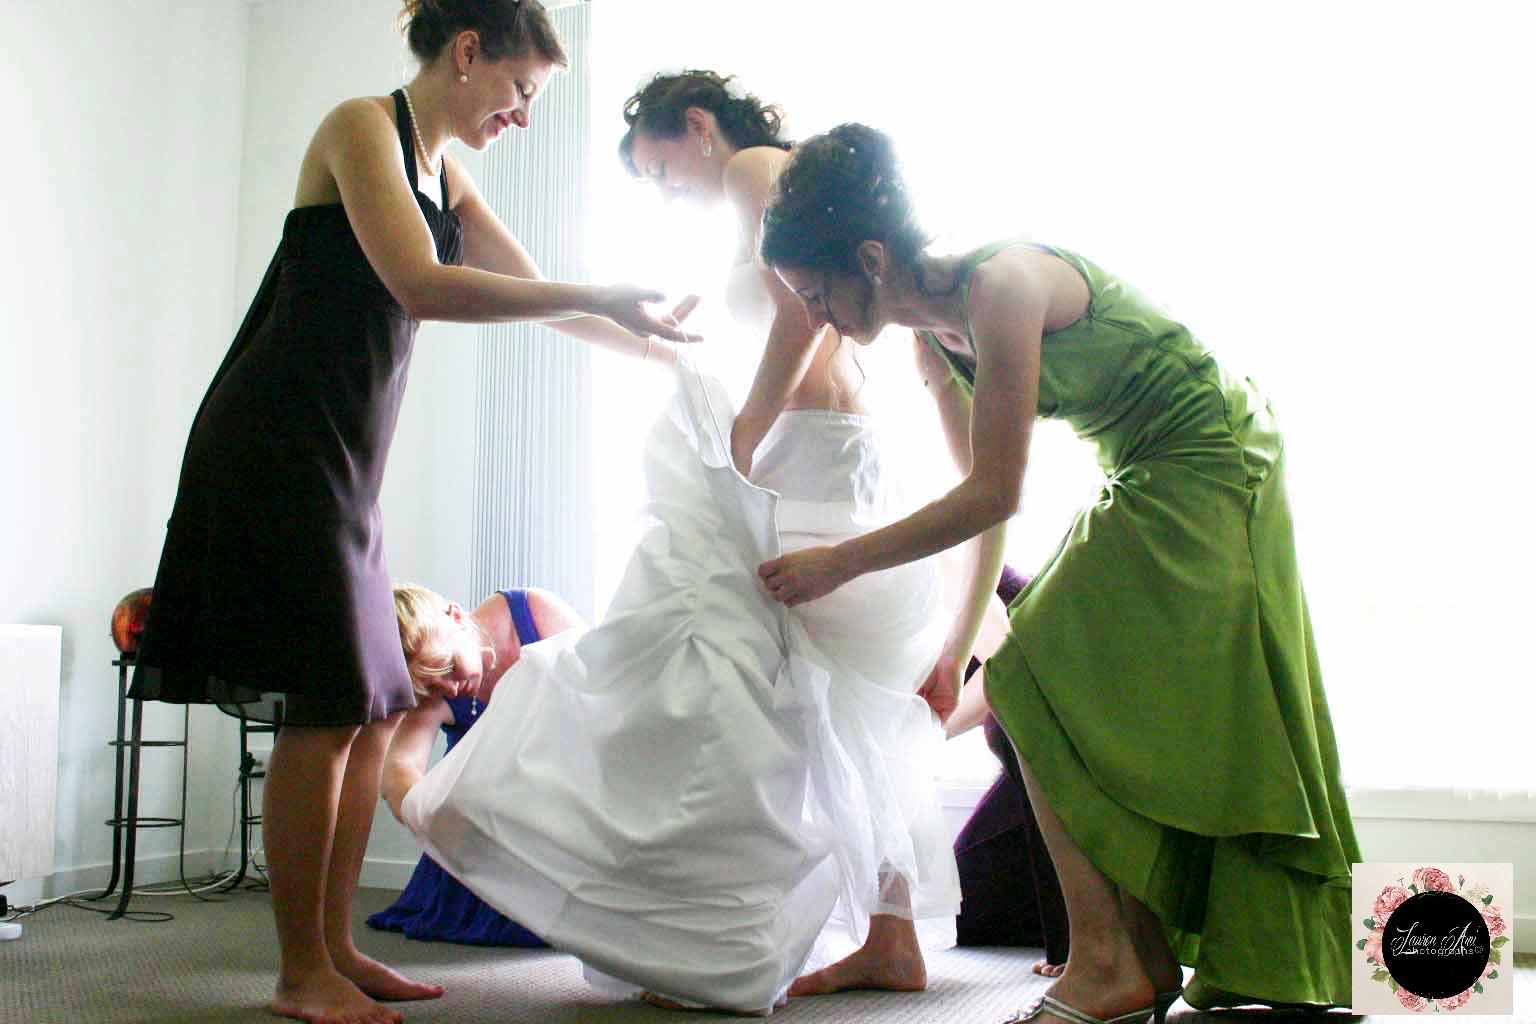 So much light bringing elegance to a bride getting ready #laurenamiphotographs #quirkyweddingideas #Australia #bridalbeauty #shoes #heart #sunshinecoastpo